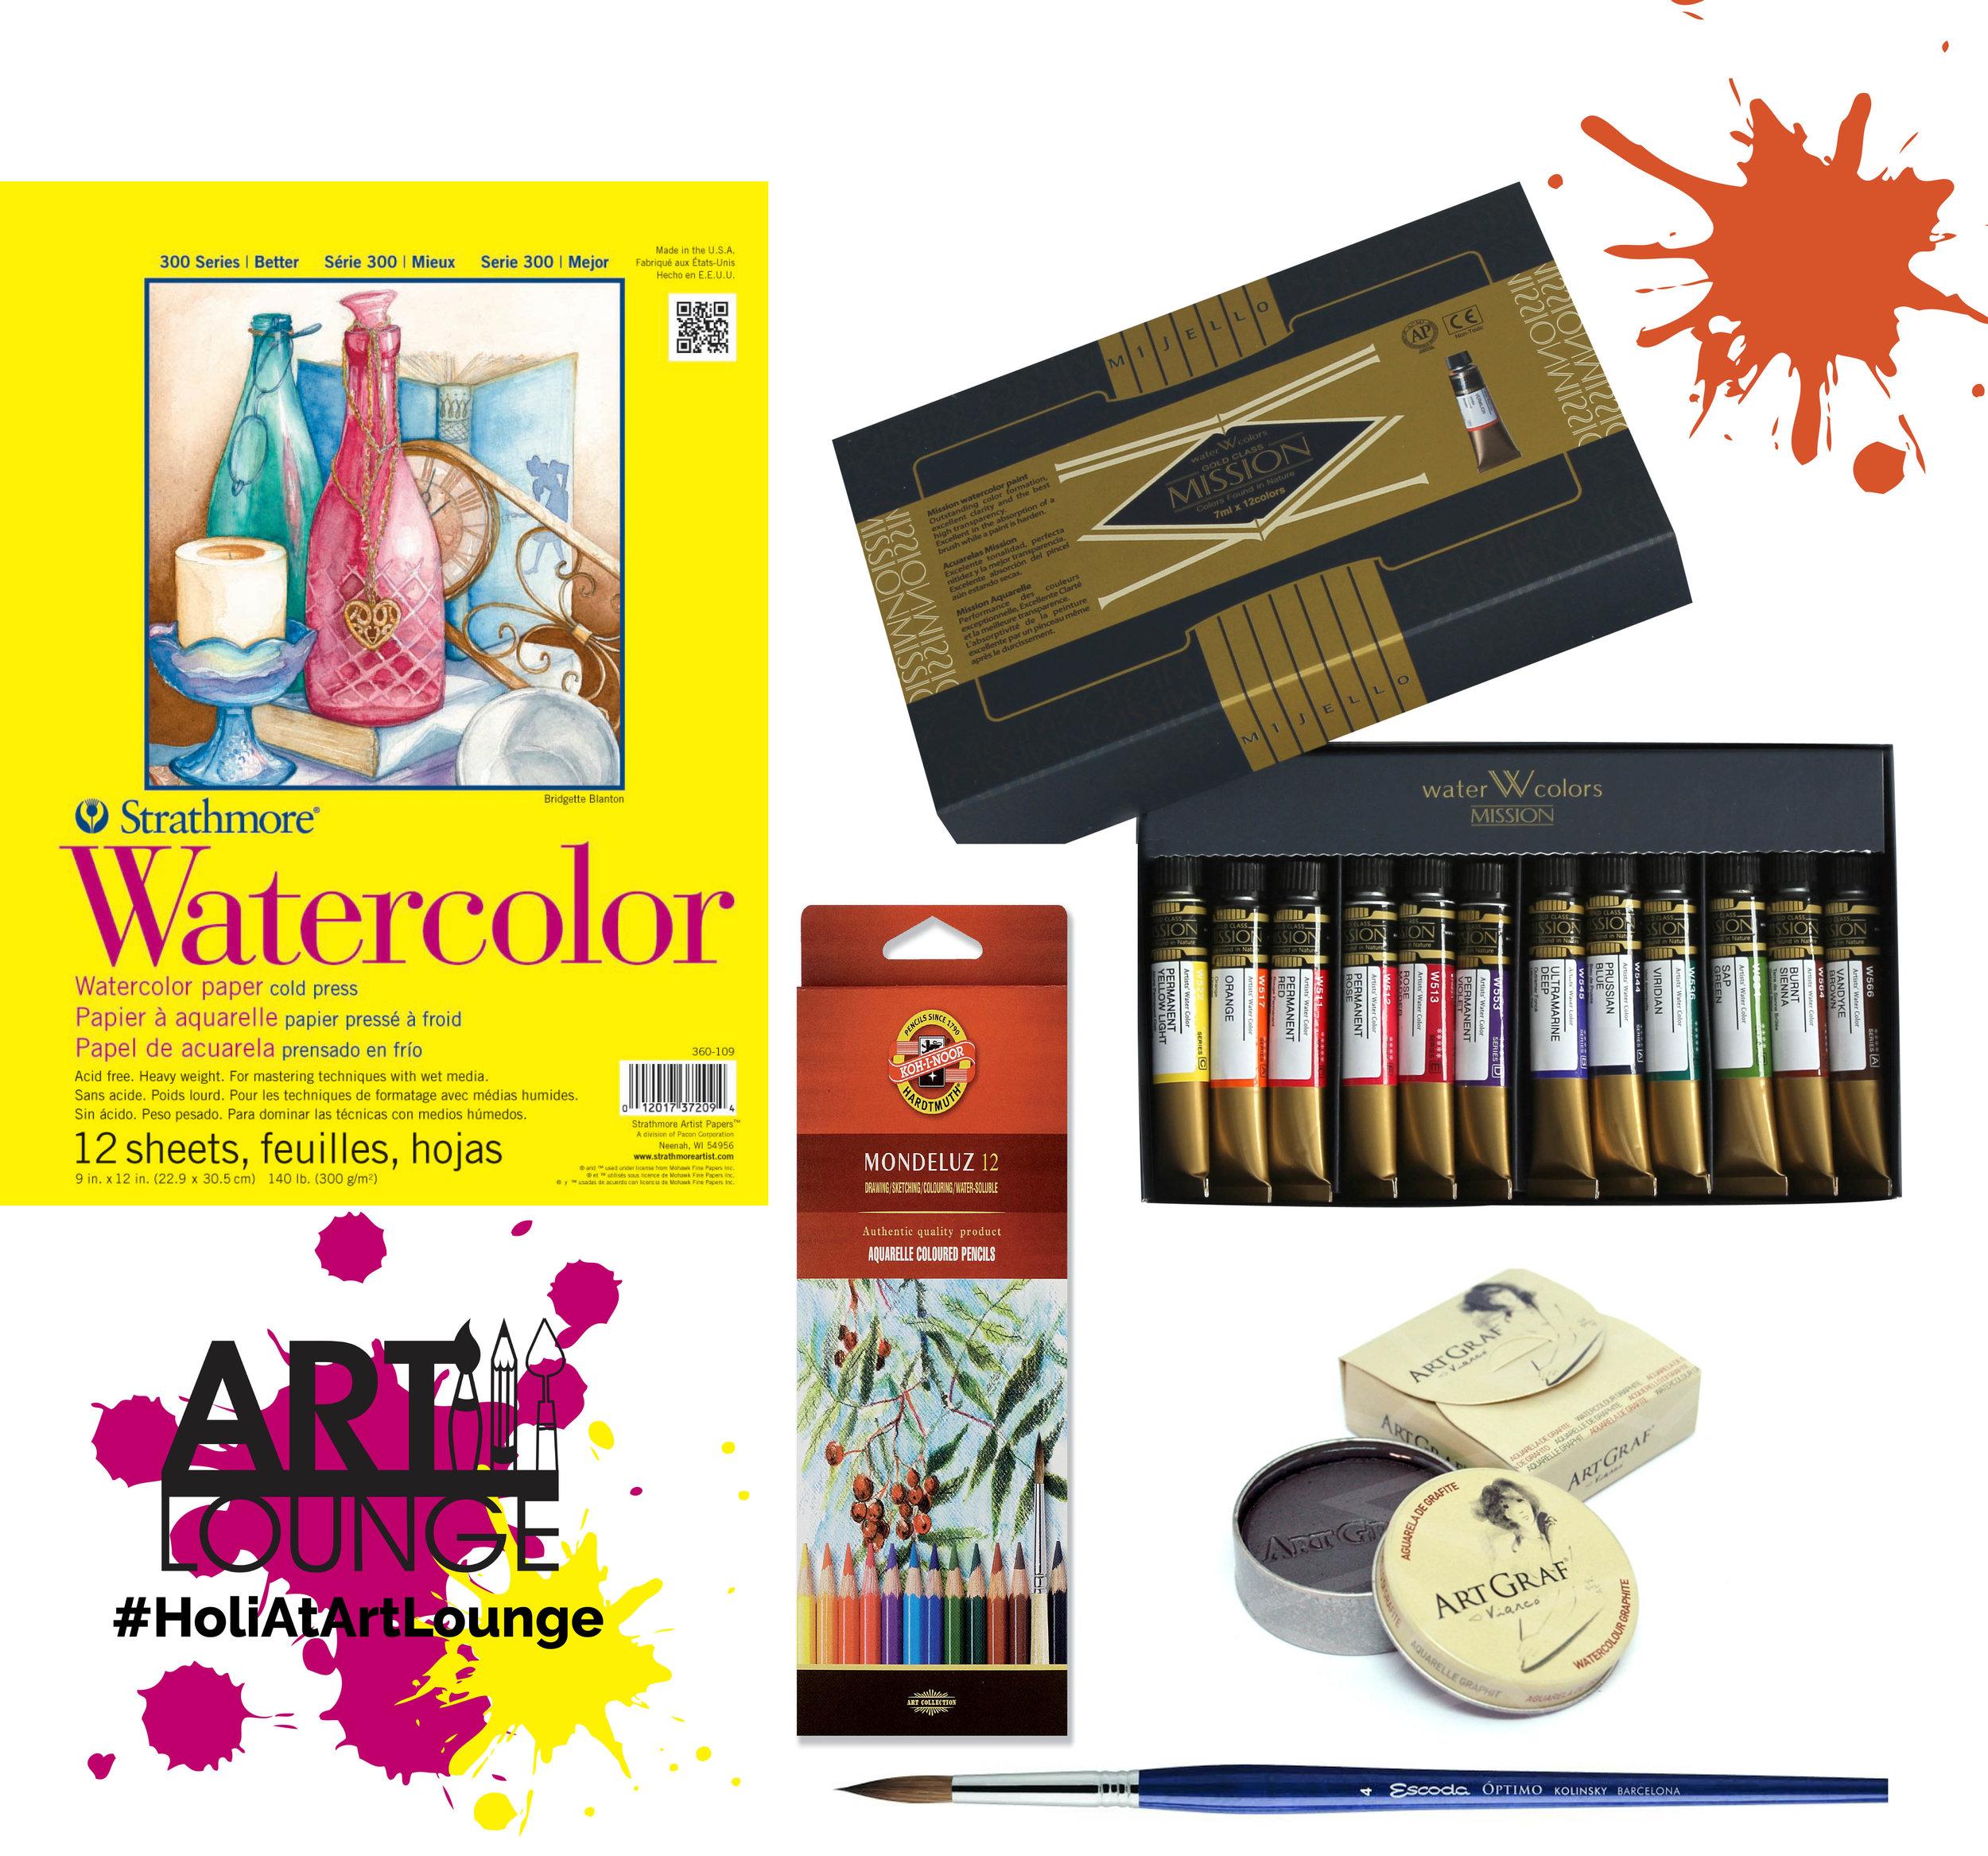 1.  Strathmore 300 Watercolor 9x12in pad  2.  Mission Gold 7mlx12 set  3.  Koh-i-Noor Mondeluz set of 12  4.  Viarco Art Graf Water Soluble Graphite Powder  5.  Escoda Kolinsky Sable size 4 brush